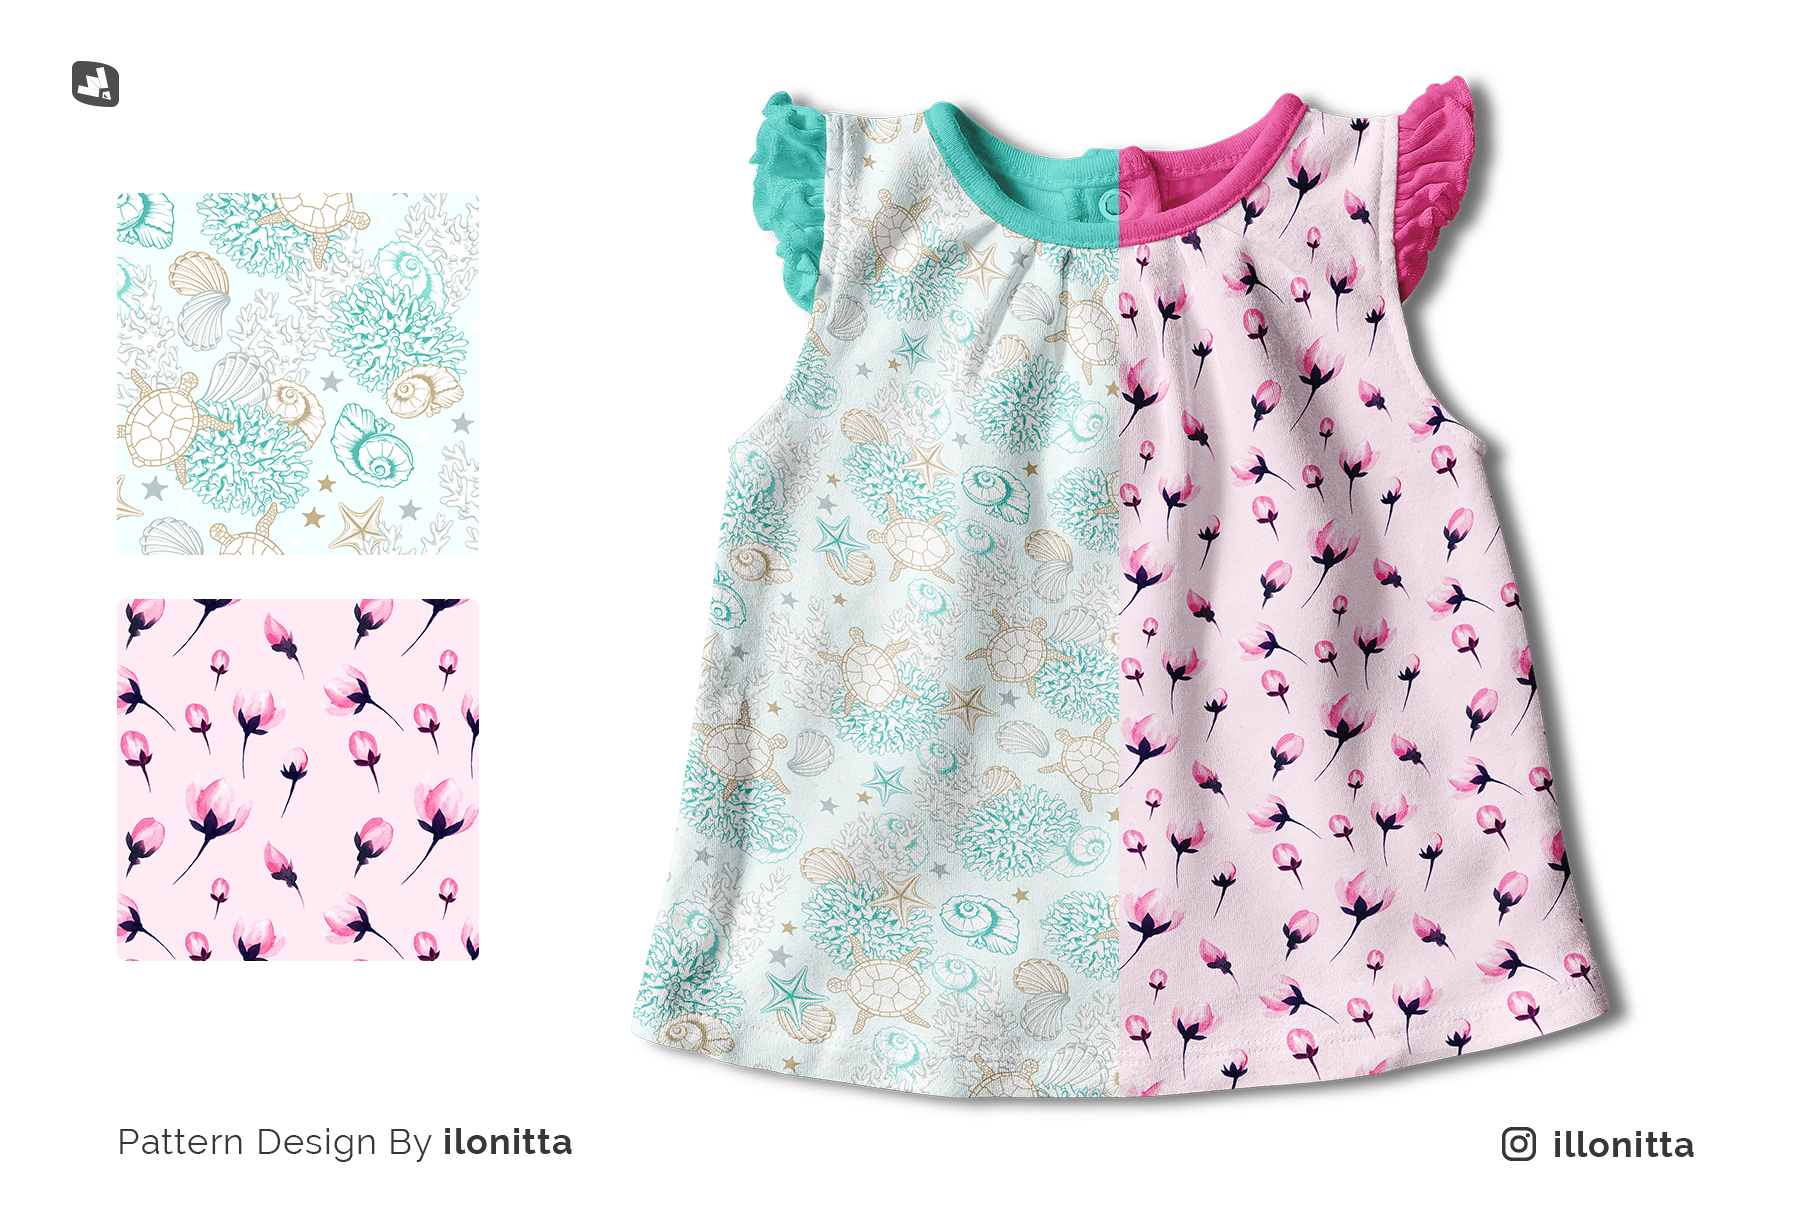 designer's credit of the ruffle sleeve baby girl top mockup